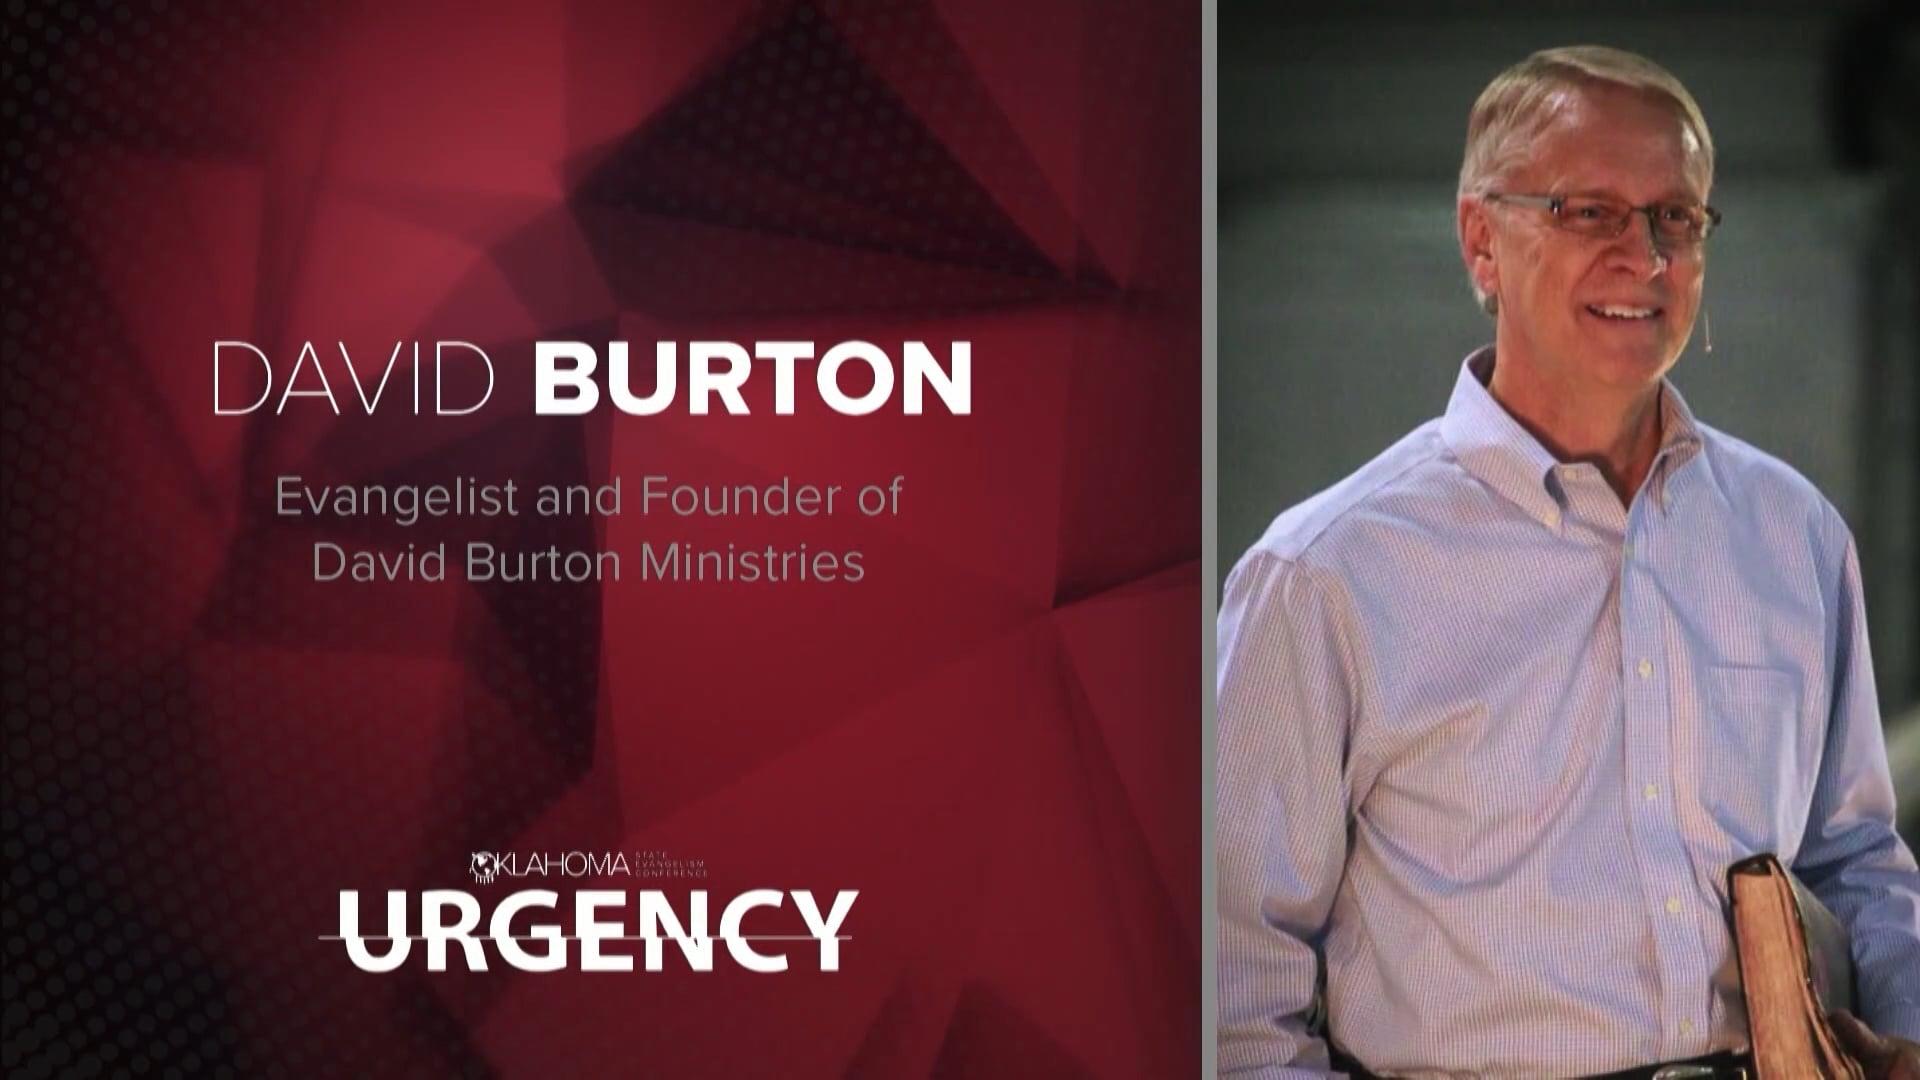 SEC 2018 - Monday Afternoon - David Burton